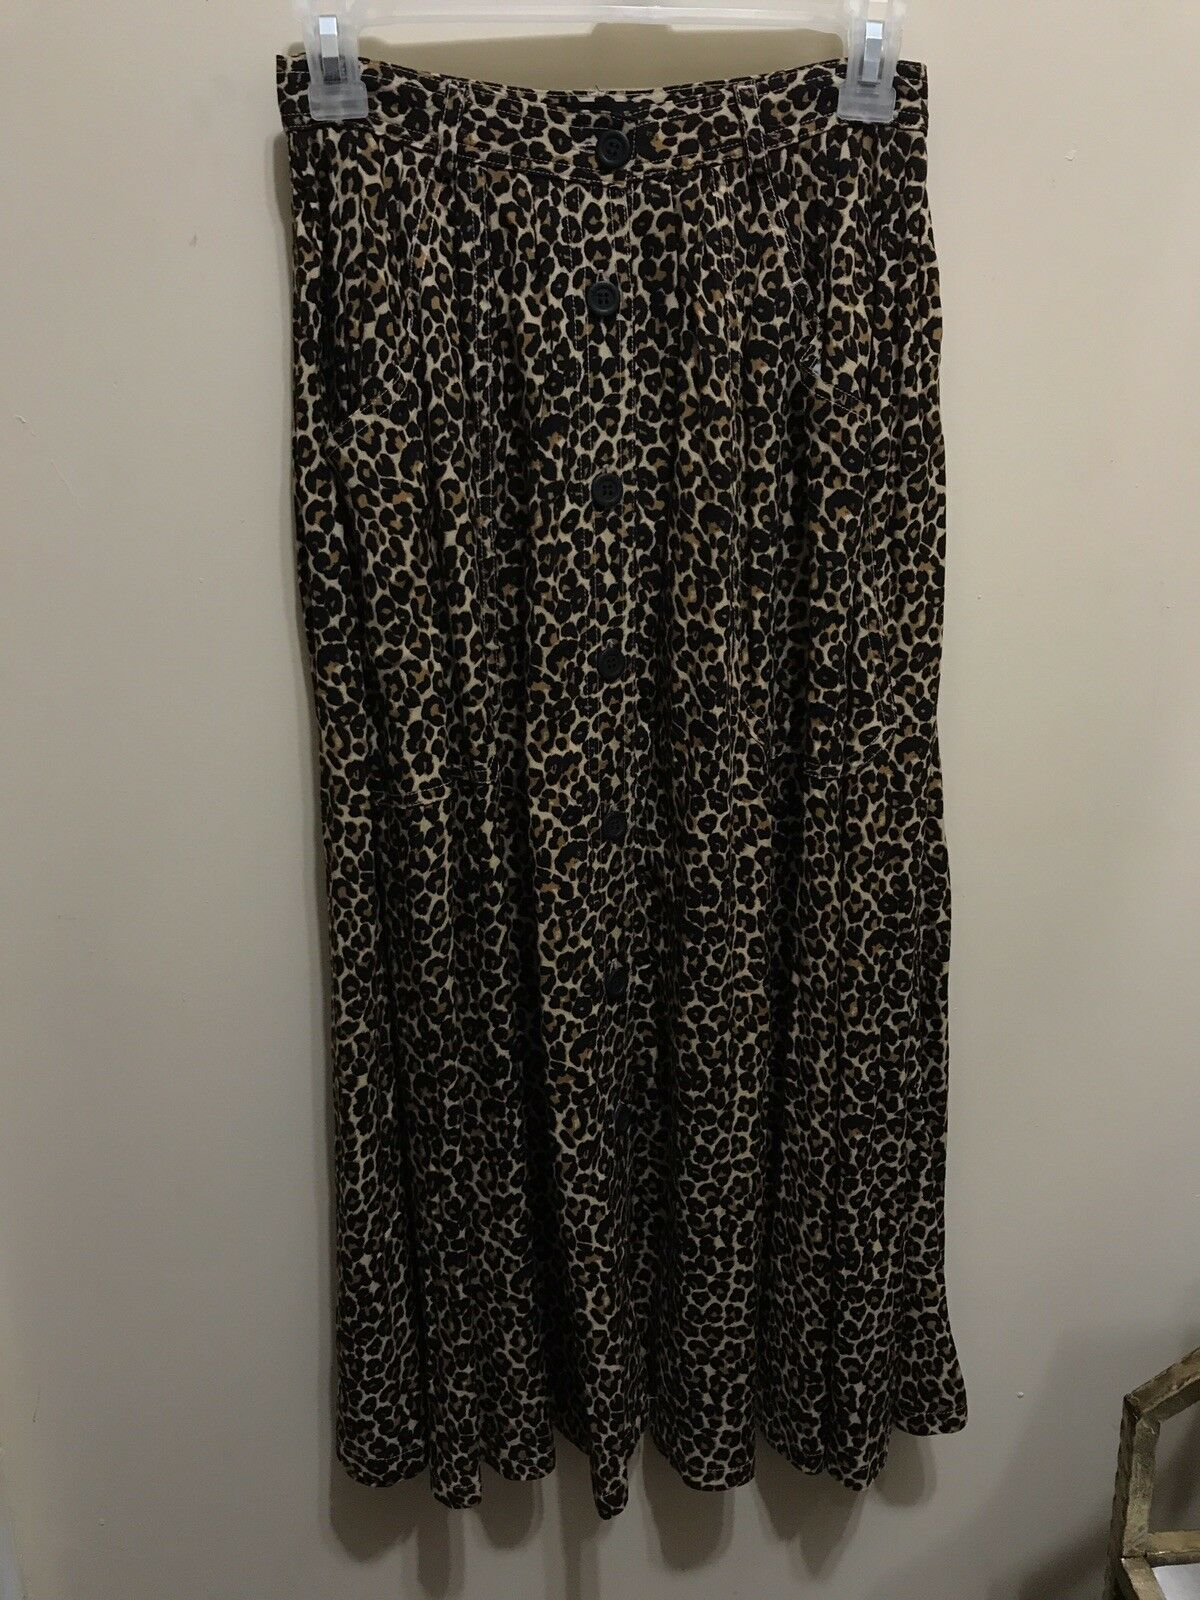 Original American Apparel Leopard Print Skirt